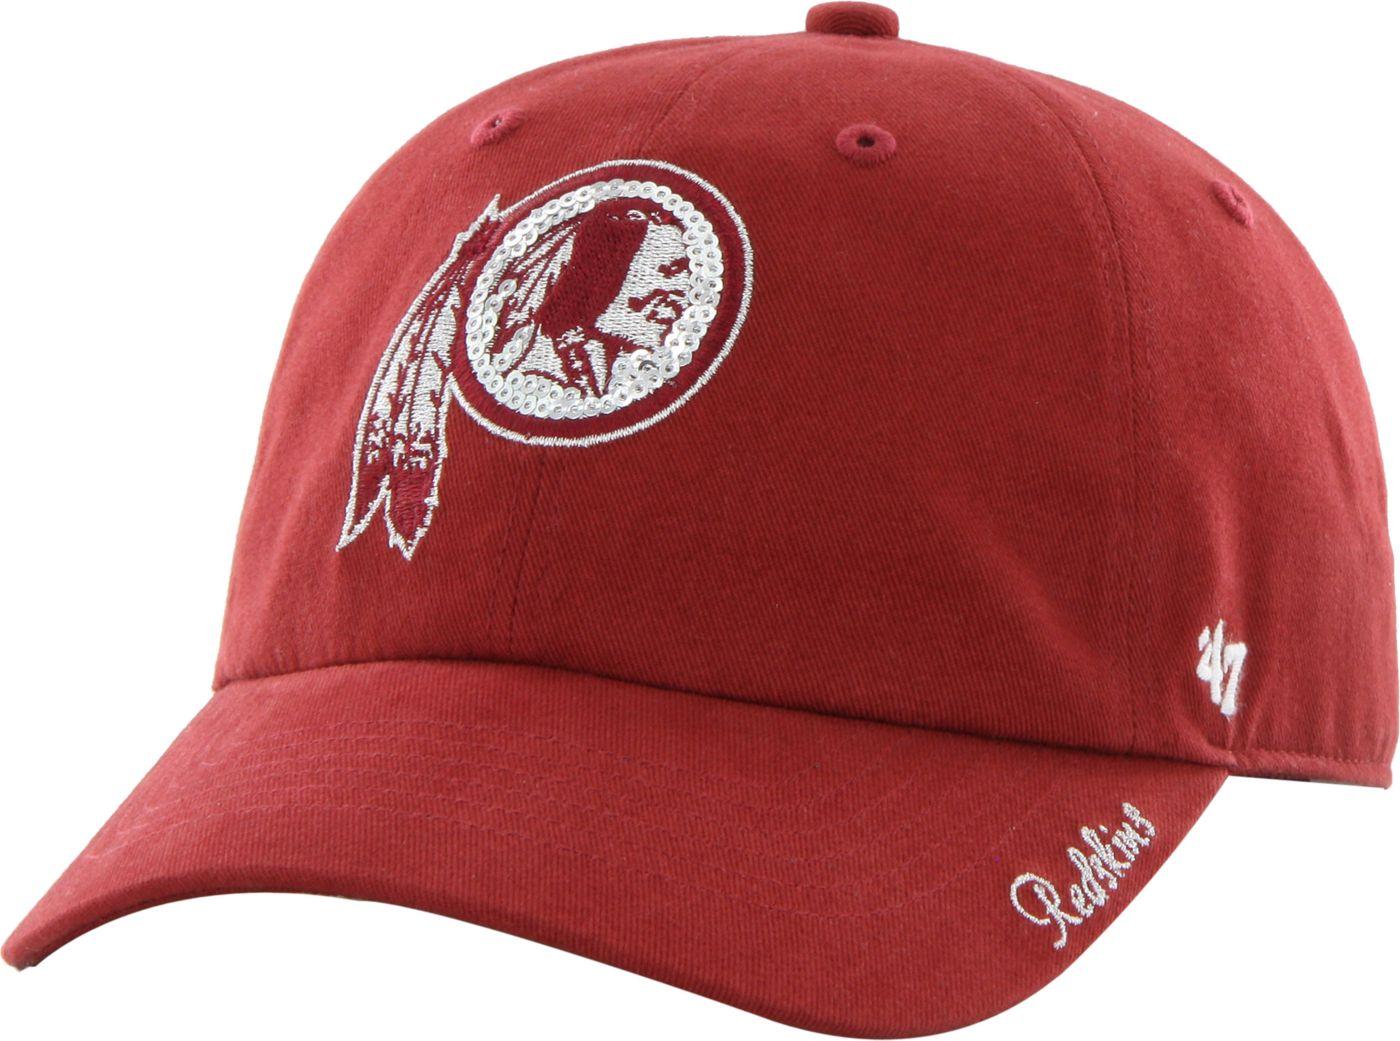 '47 Women's Washington Redskins Sparkle Logo Red Adjustable Hat